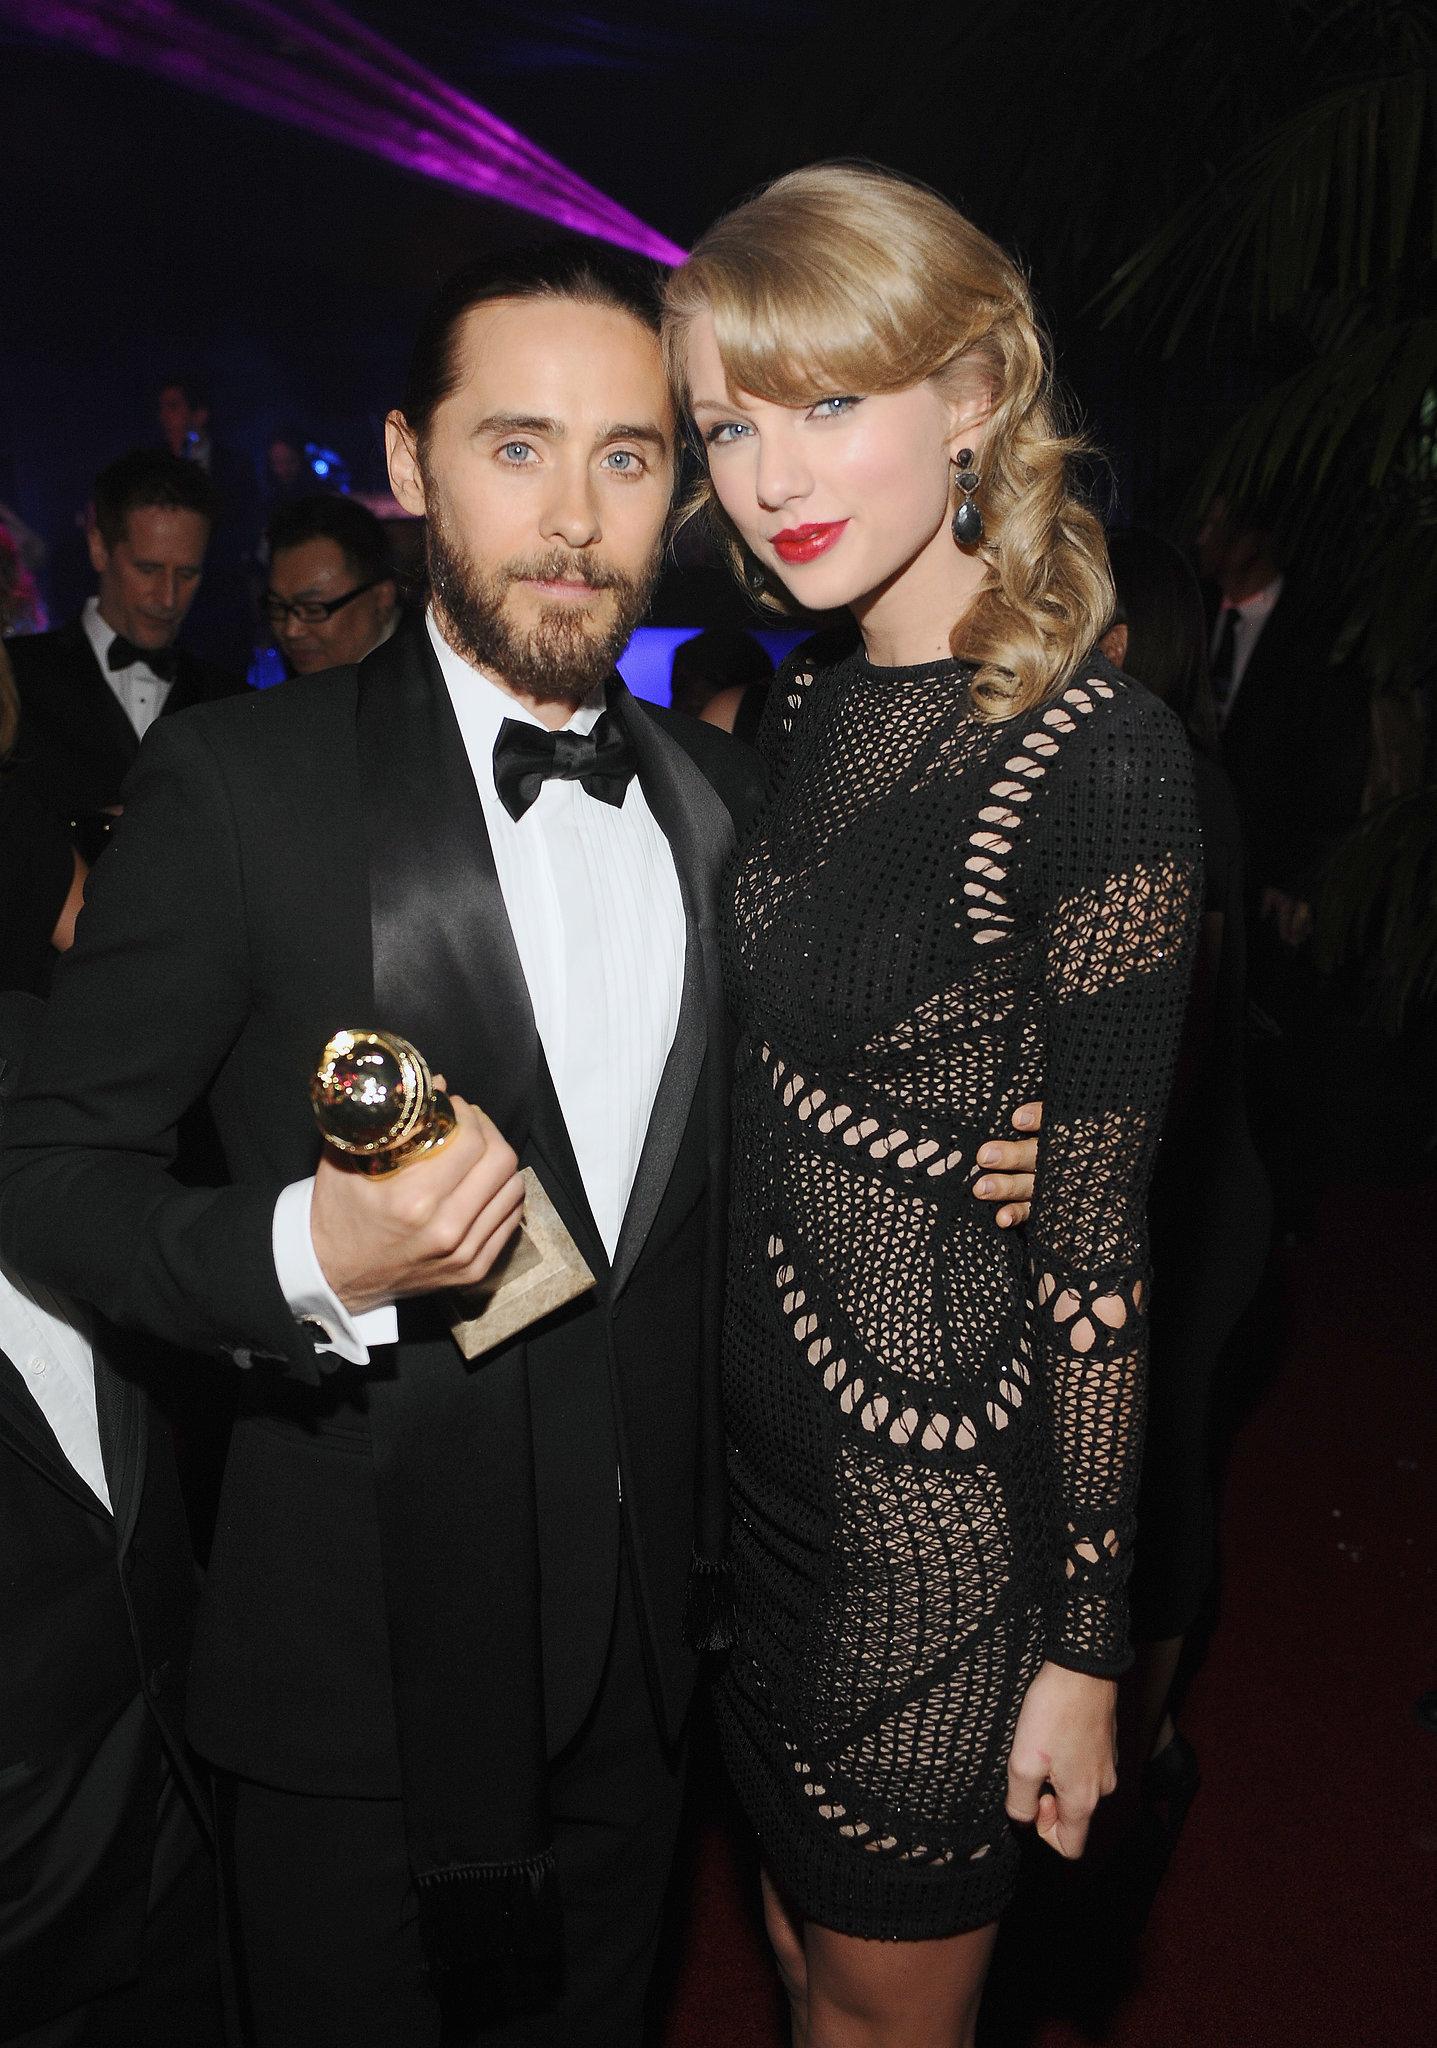 Taylor Swift and Jared Leto mingled inside the bash.